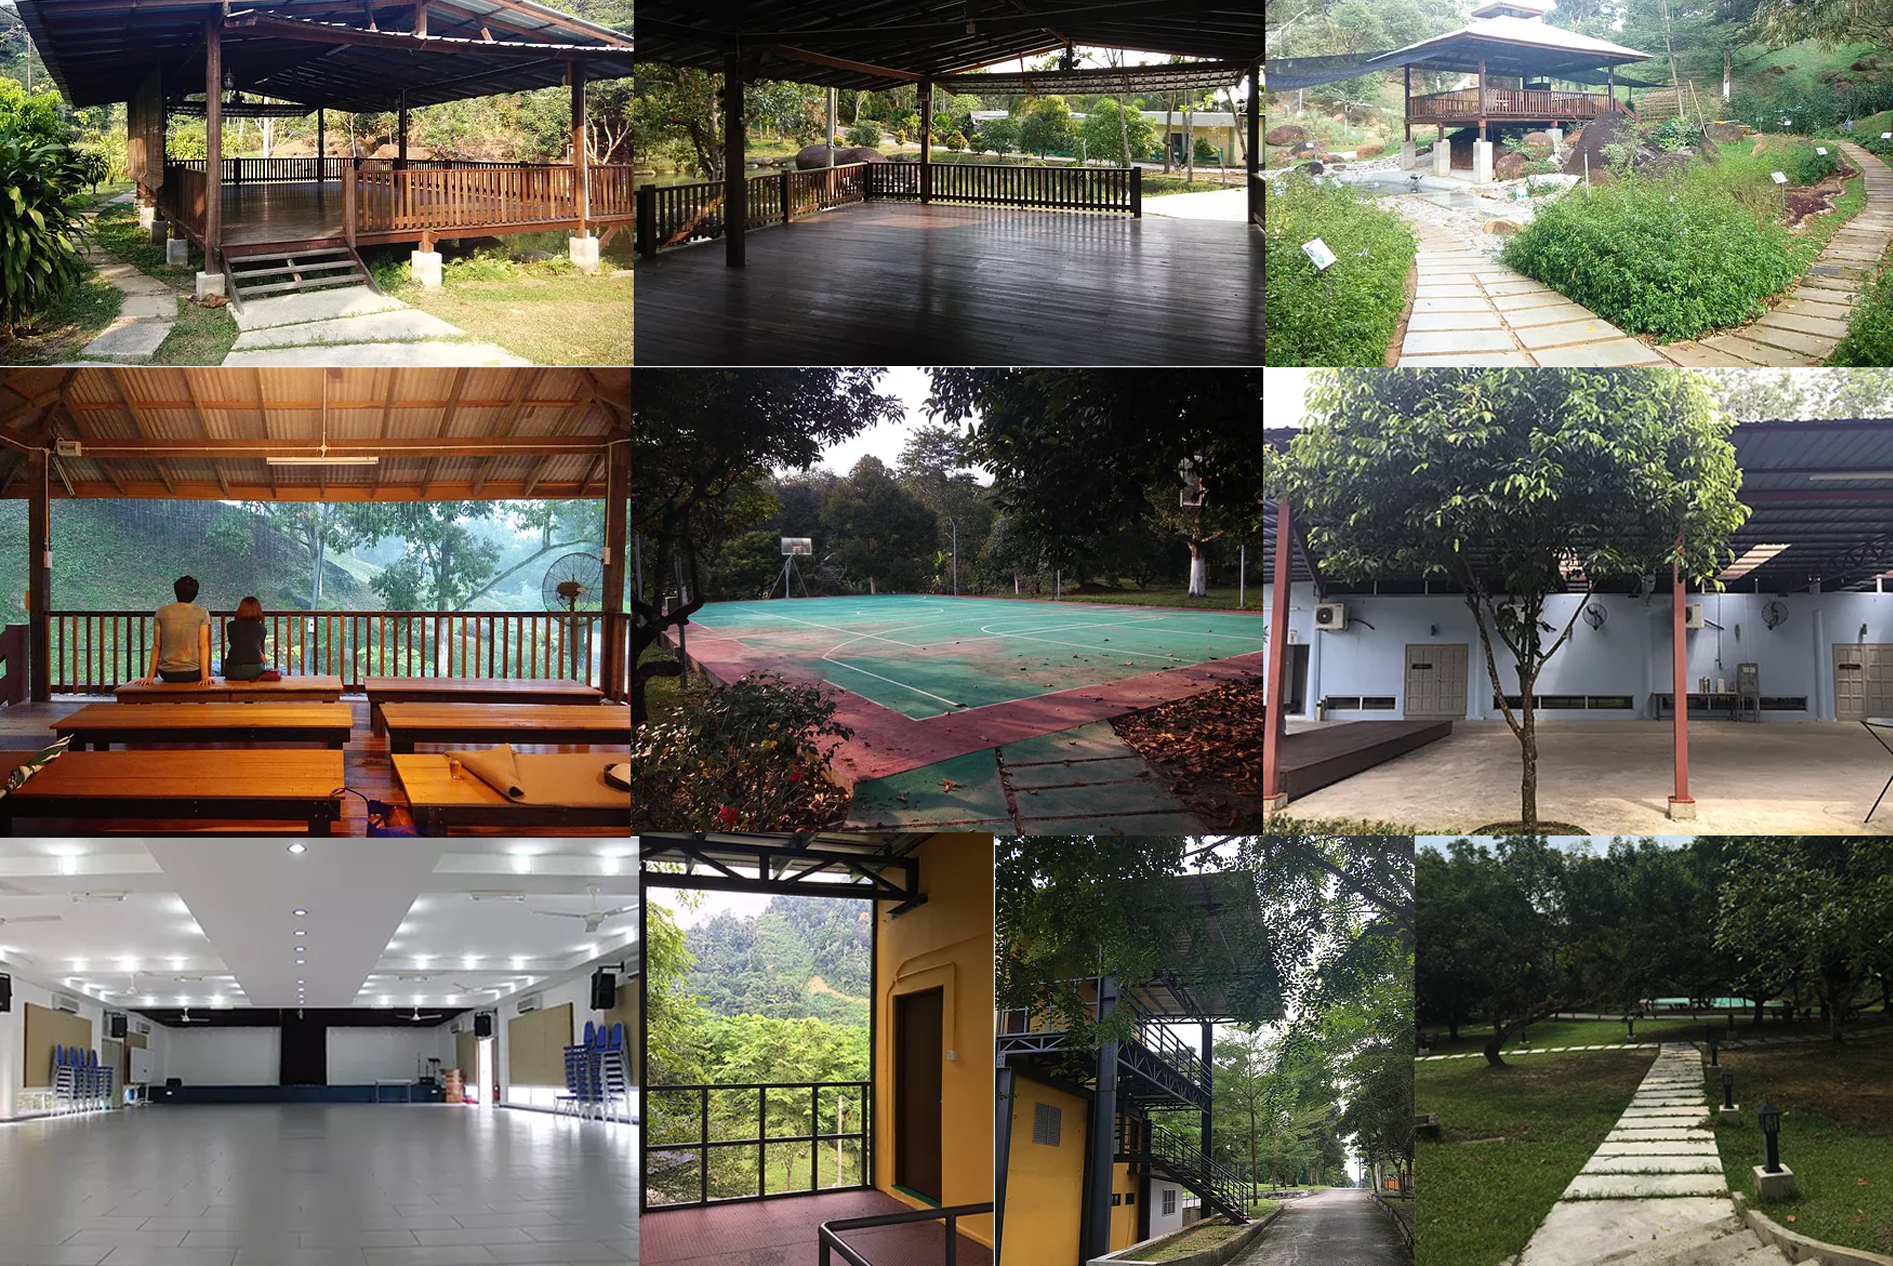 refreshing_springs_resort_selangor_camping_site_malaysia_car_camping-10